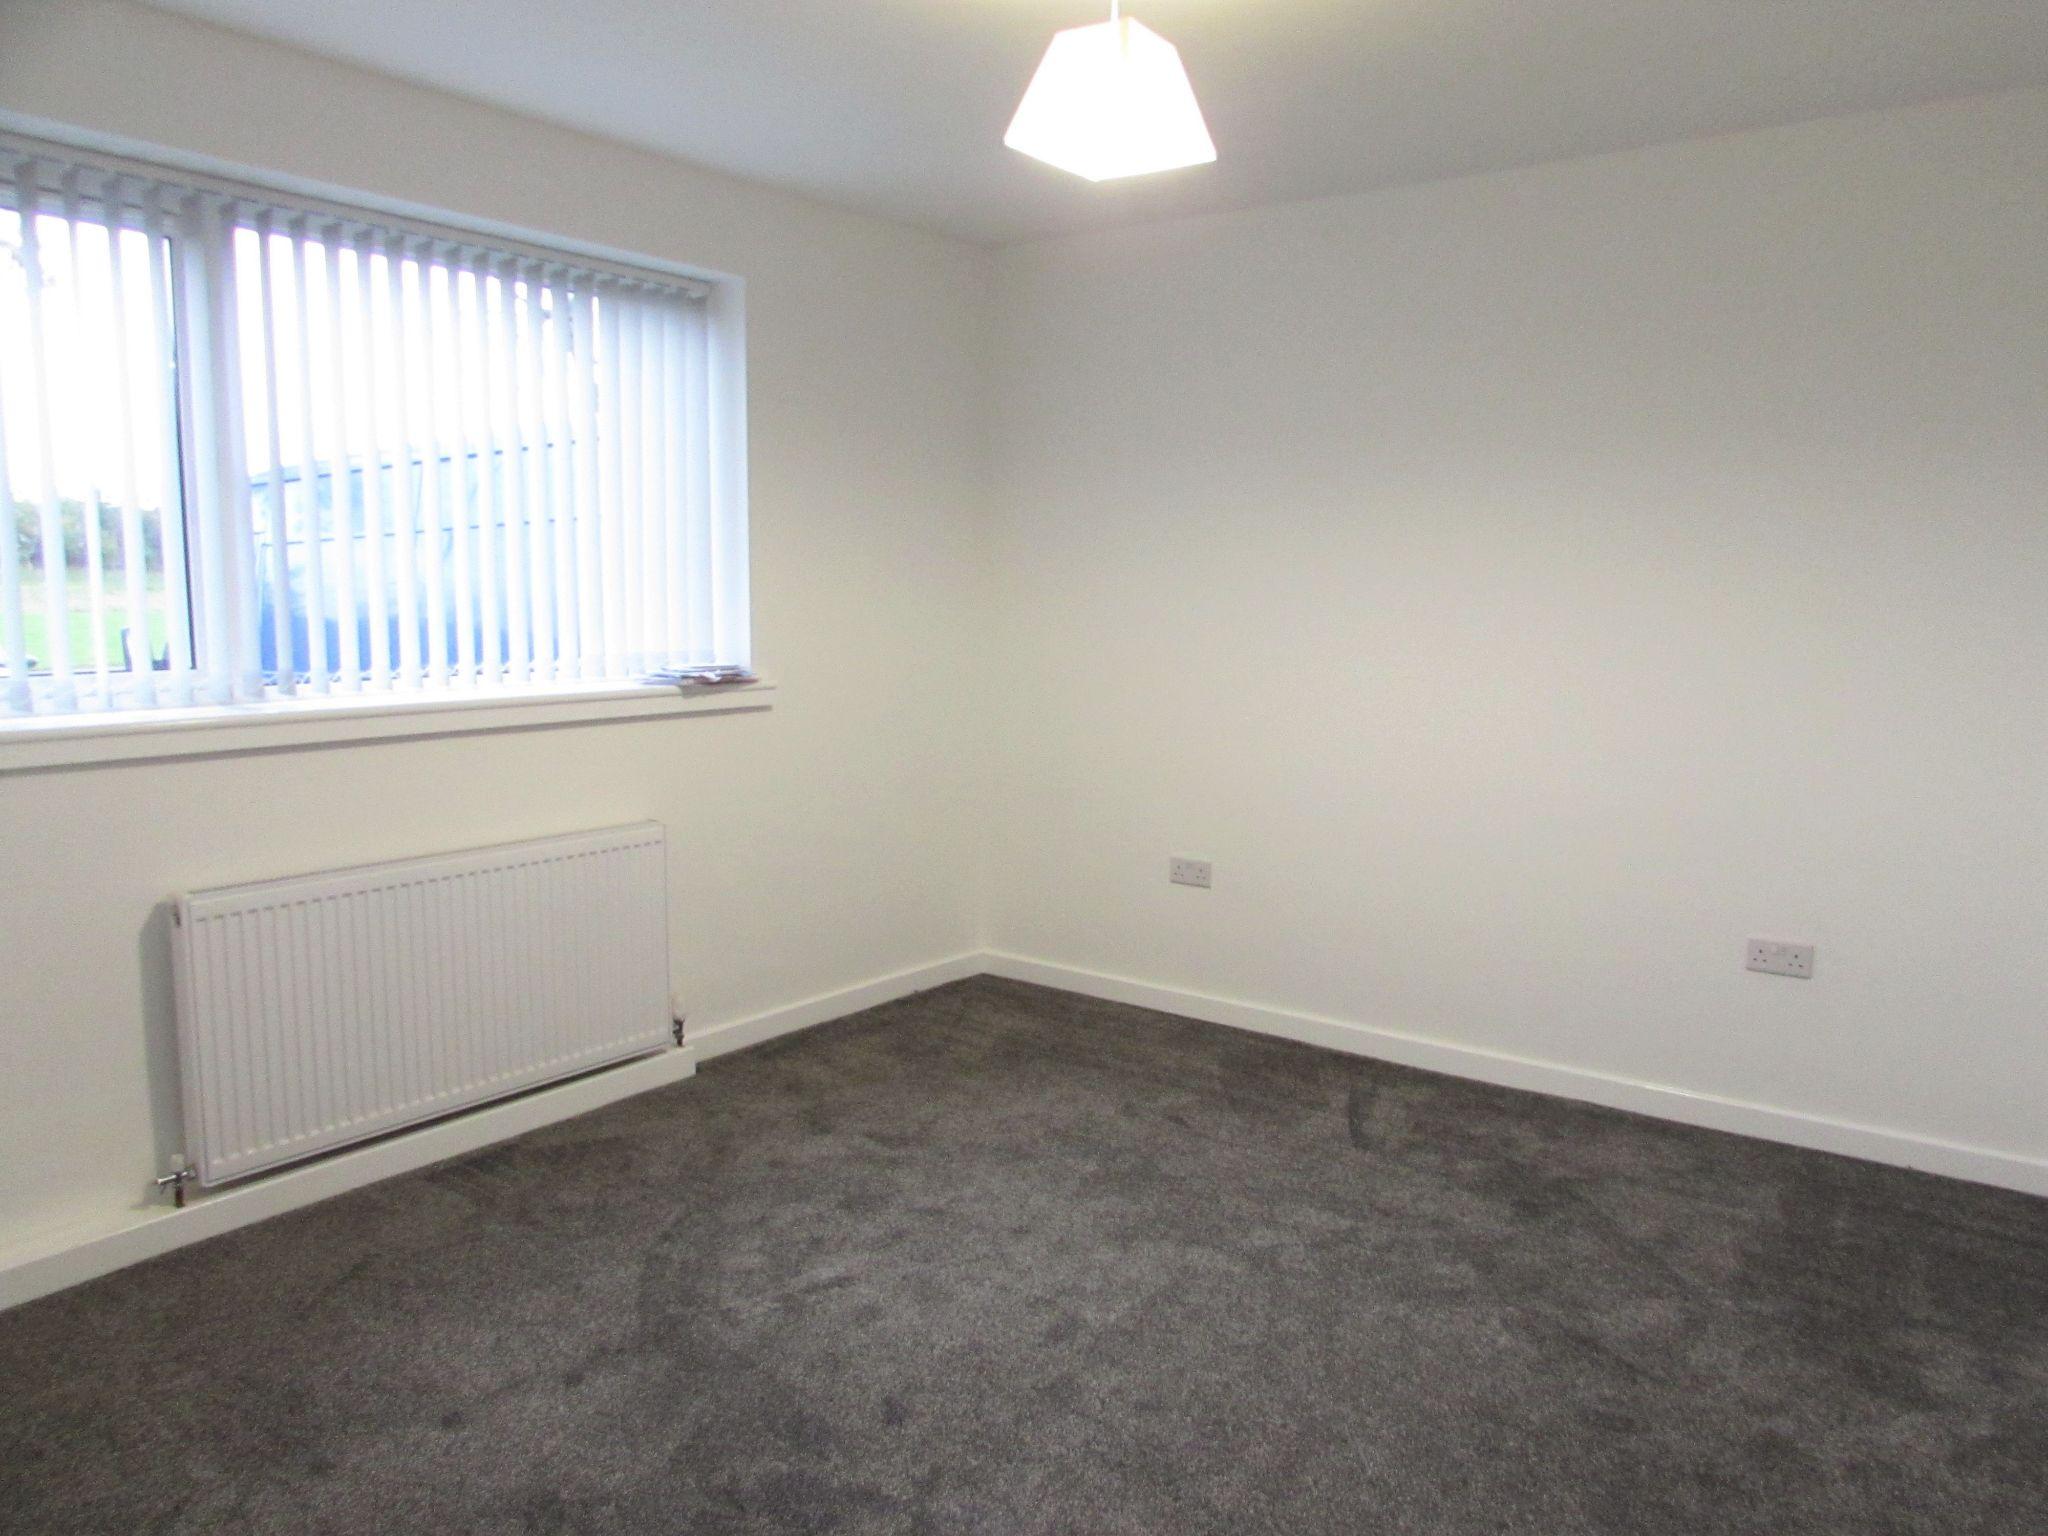 2 Bedroom Ground Floor Flat/apartment To Rent - Photograph 11